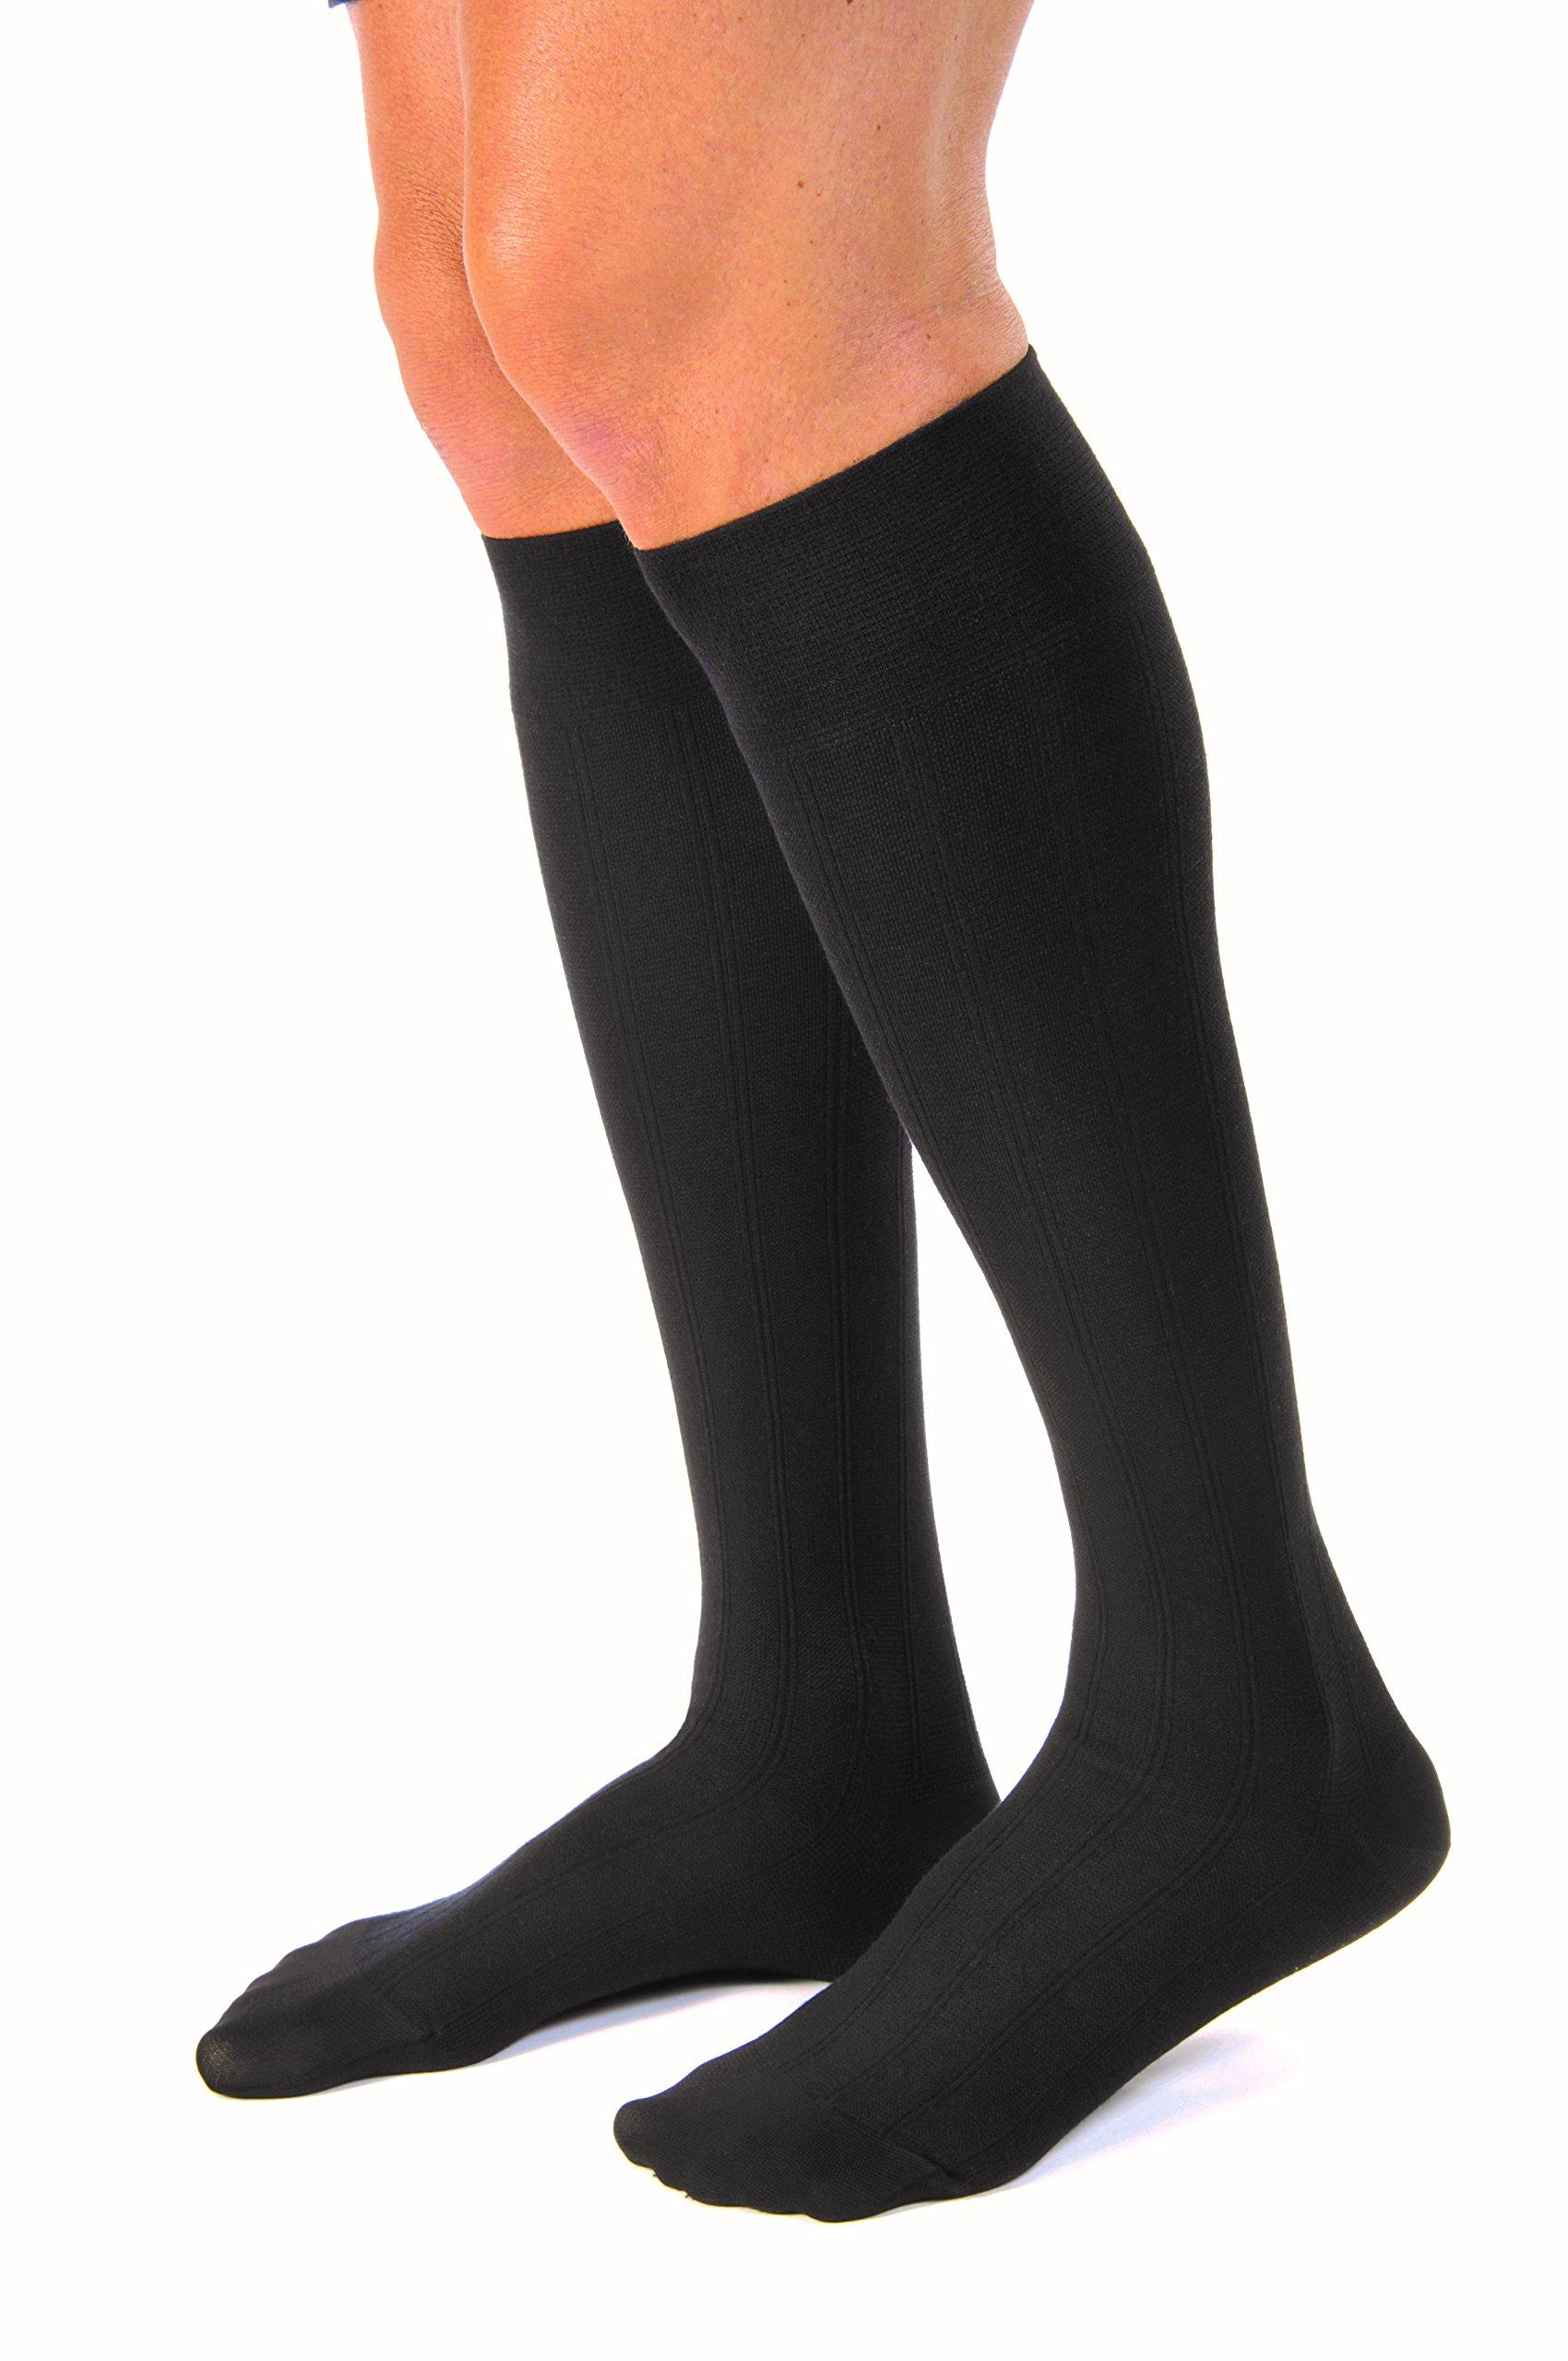 JOBST forMen Casual 15-20 mmHg Knee High Compression Socks, Black, Medium by JOBST